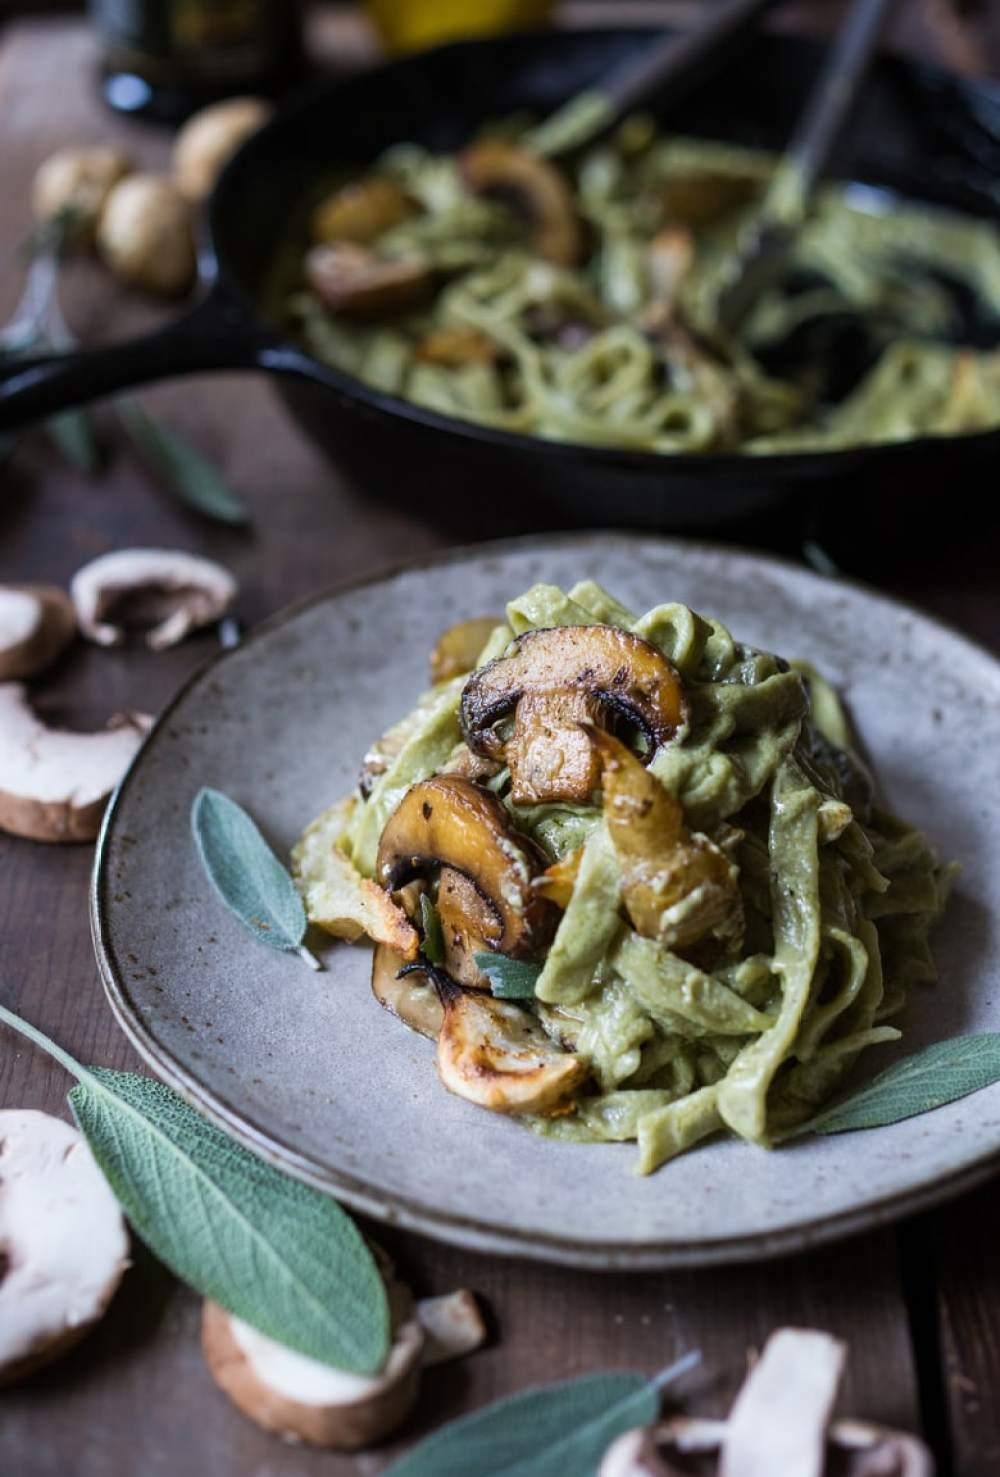 Pasta with Creamy Vegan Artichoke Sauce, Mushrooms and Sunchokes